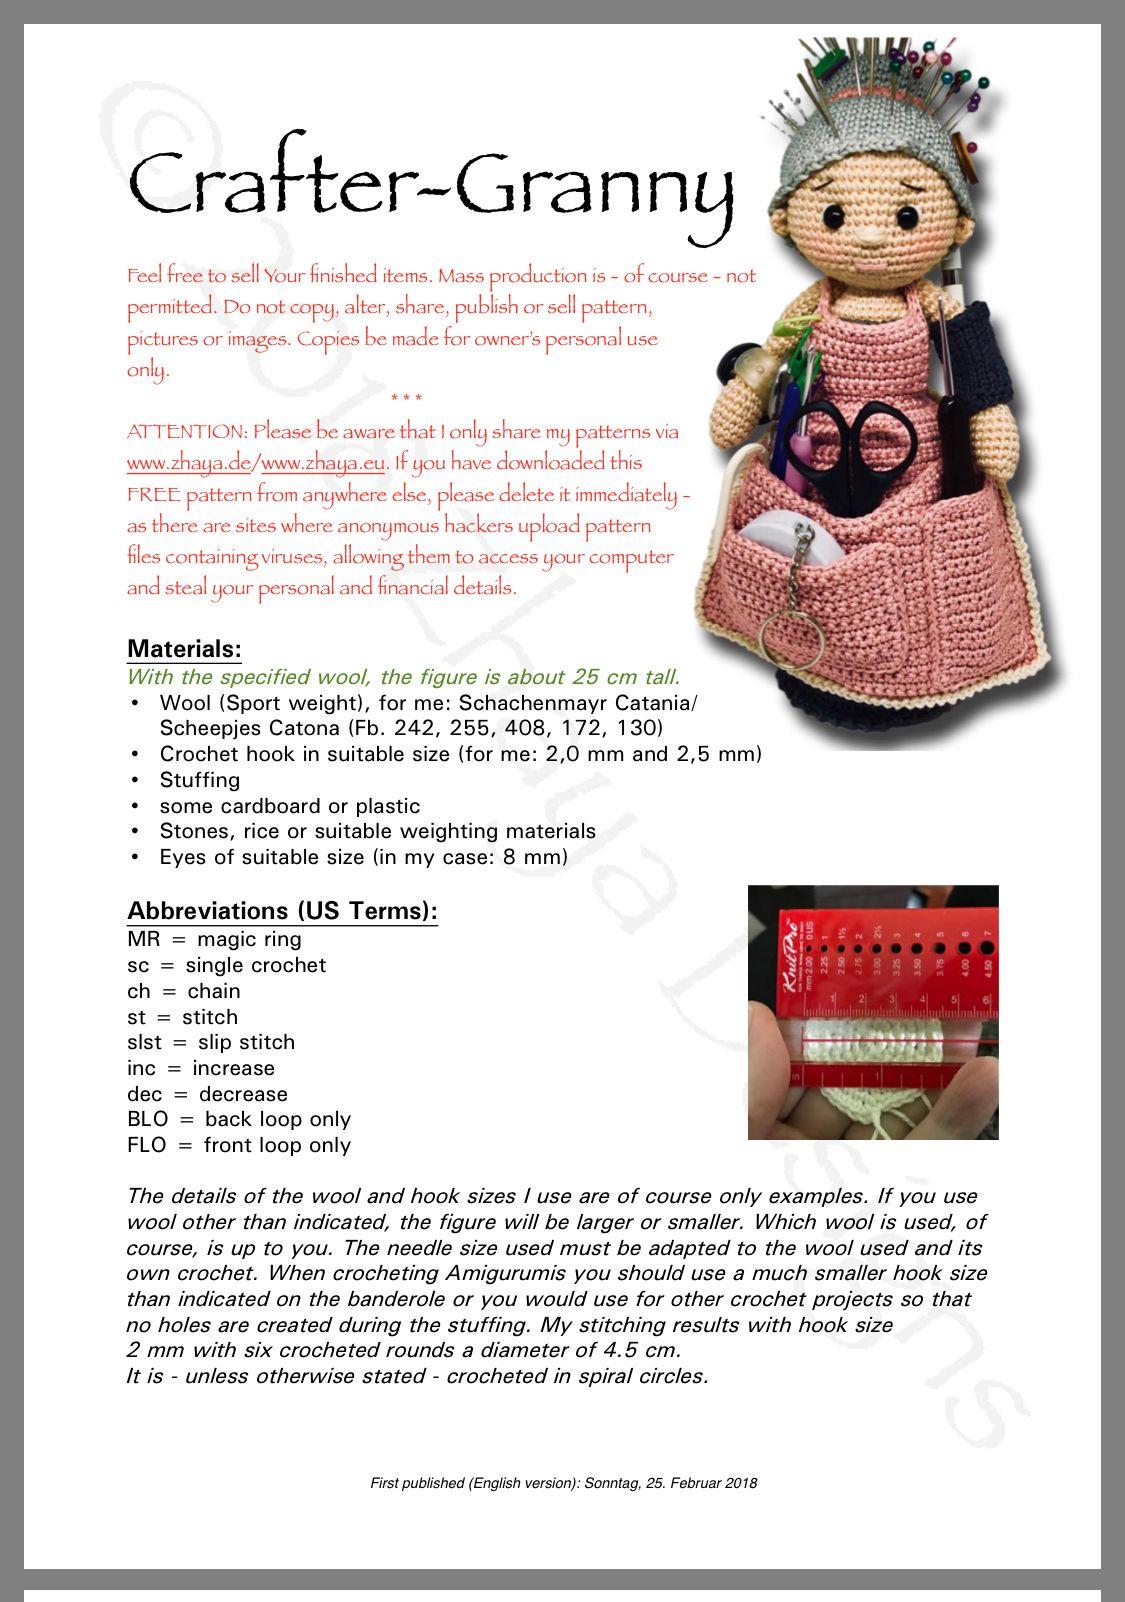 Crafty Granny Supply Holder Crochet Dolls Free Patterns Crochet